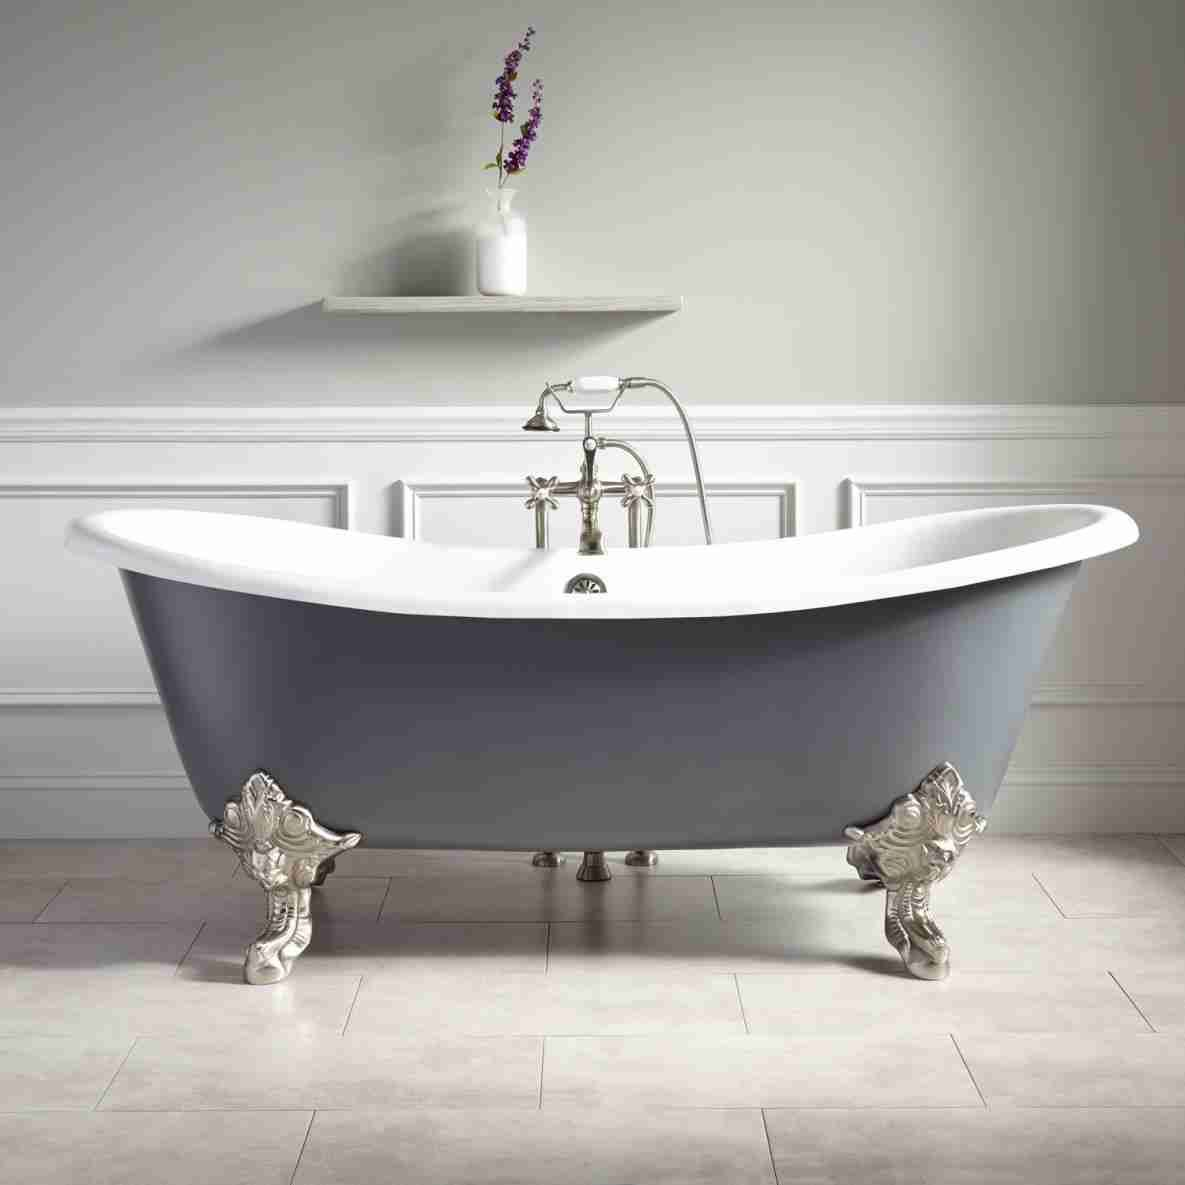 new bathroom images%0A New post Trending  foot cast iron bathtubVisitentermp  info